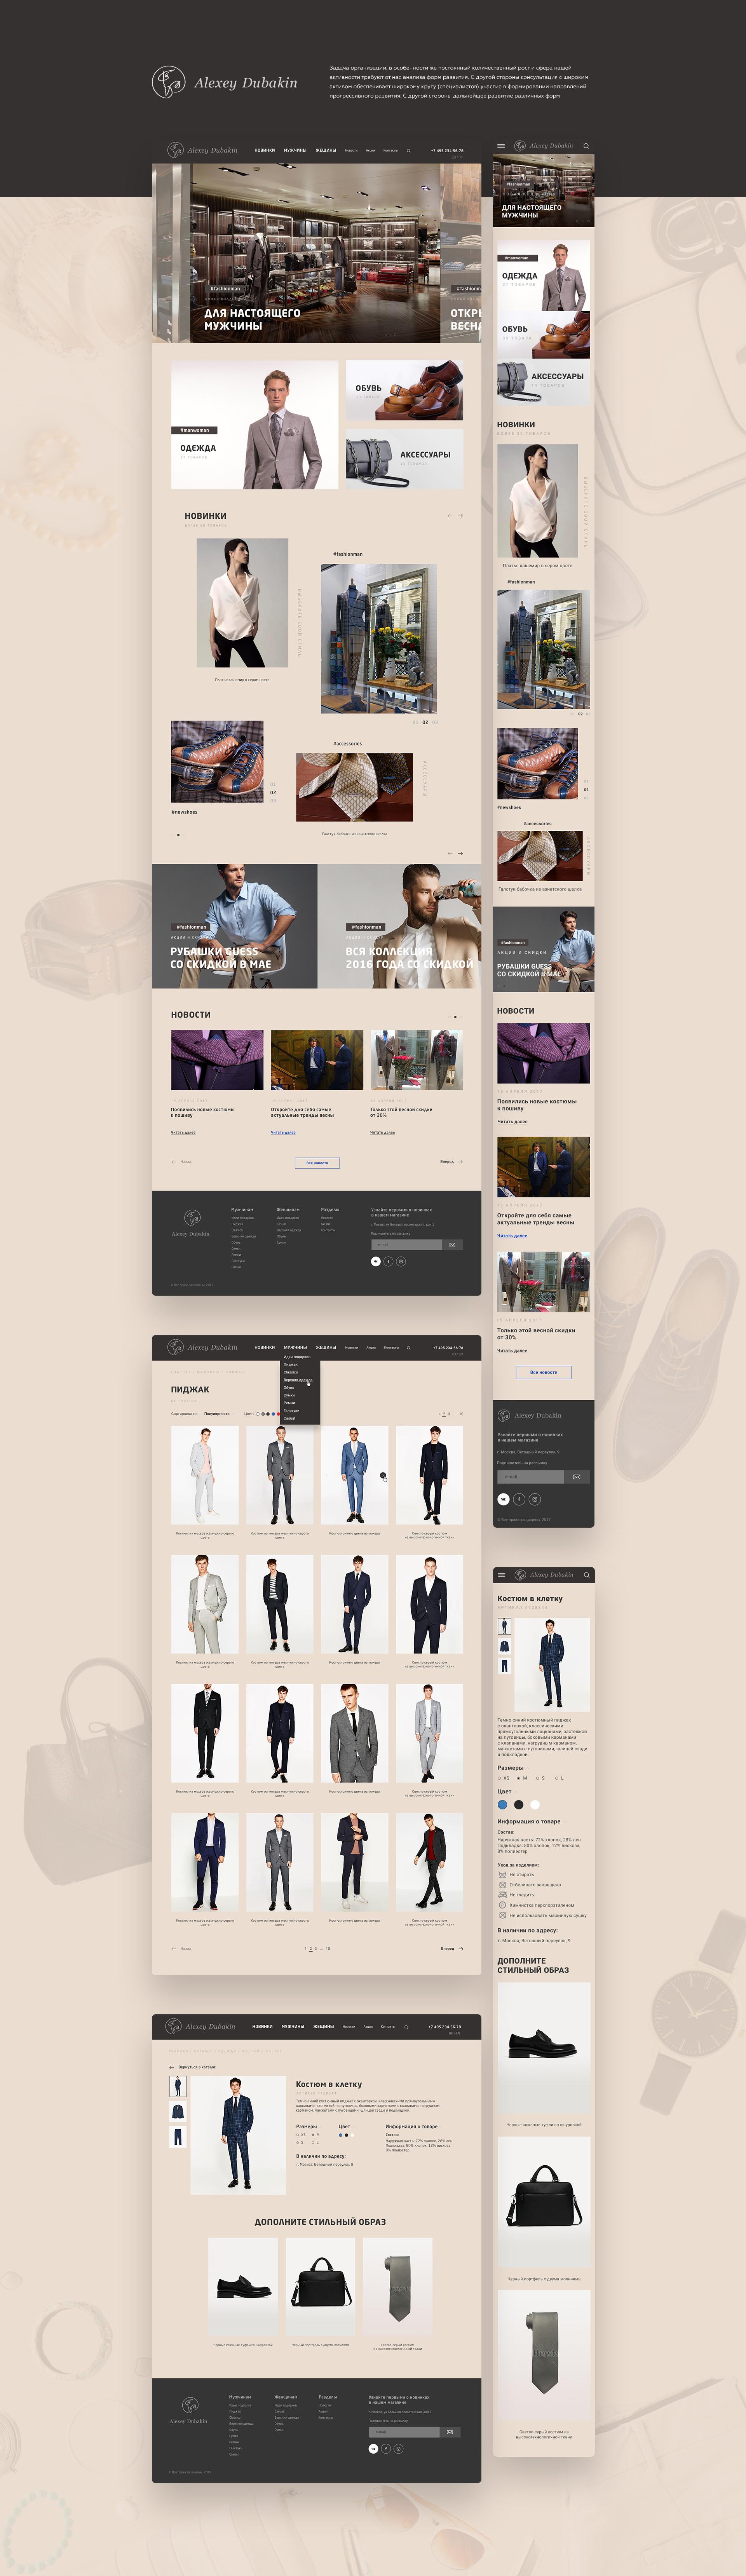 modatm.ru  Женская и мужская элегантная одежда